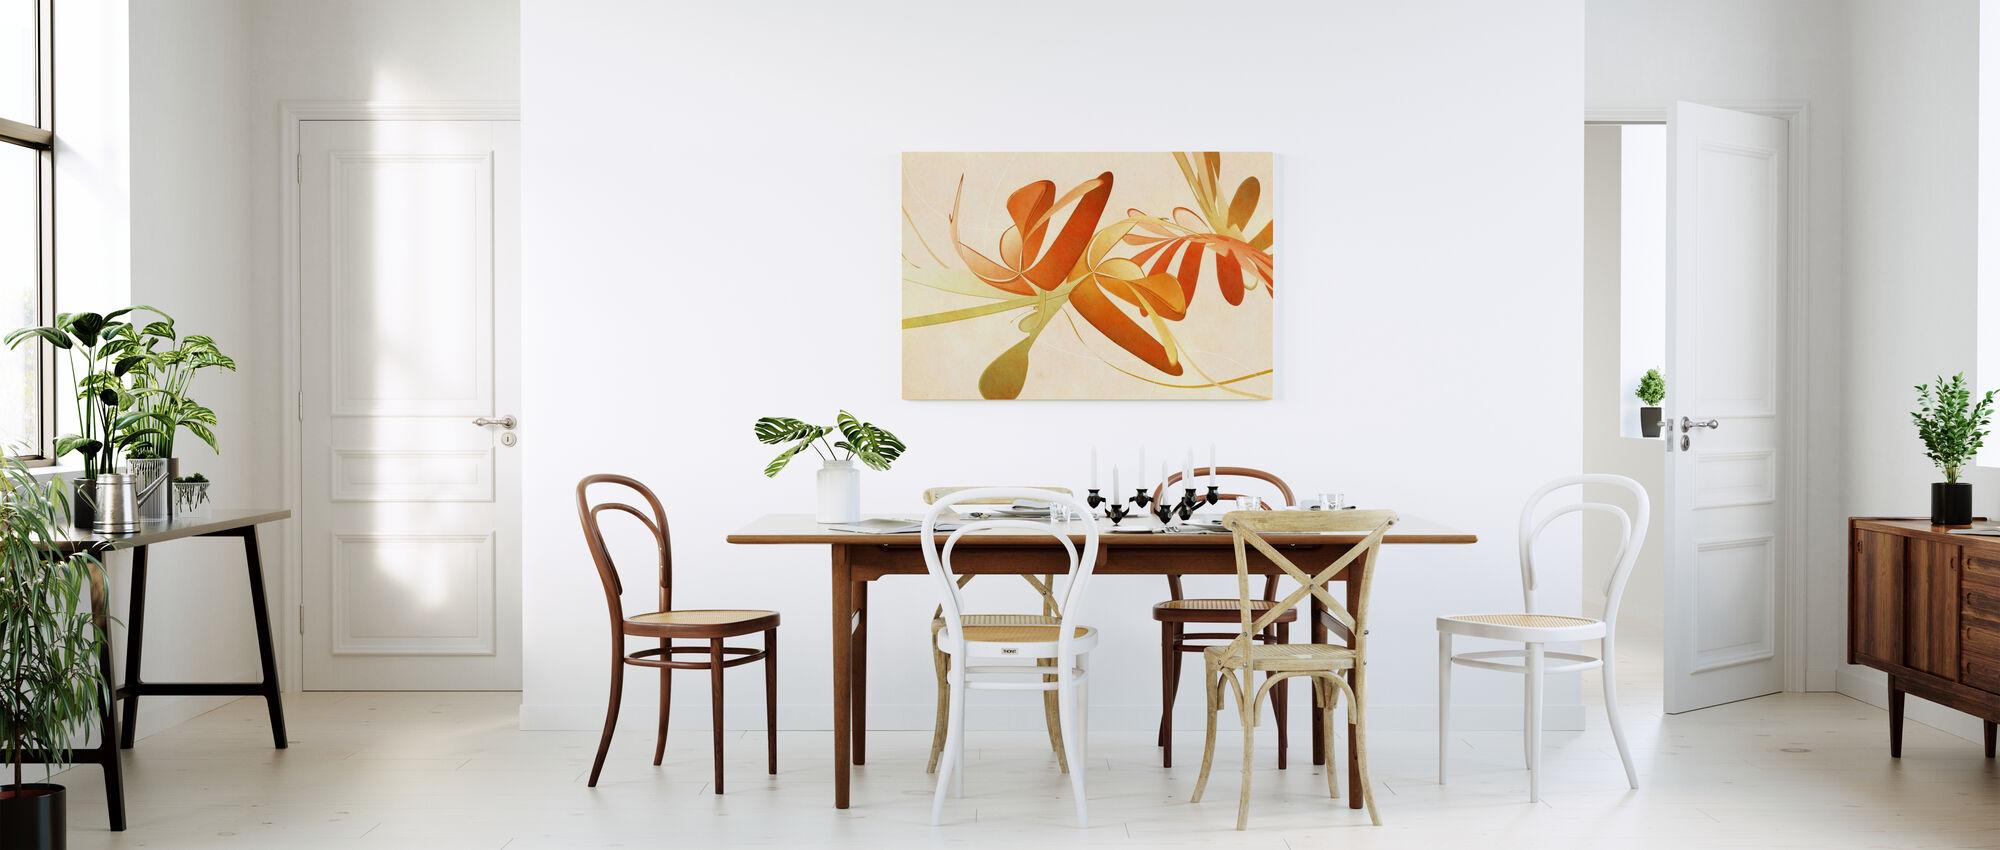 Positief - Canvas print - Keuken